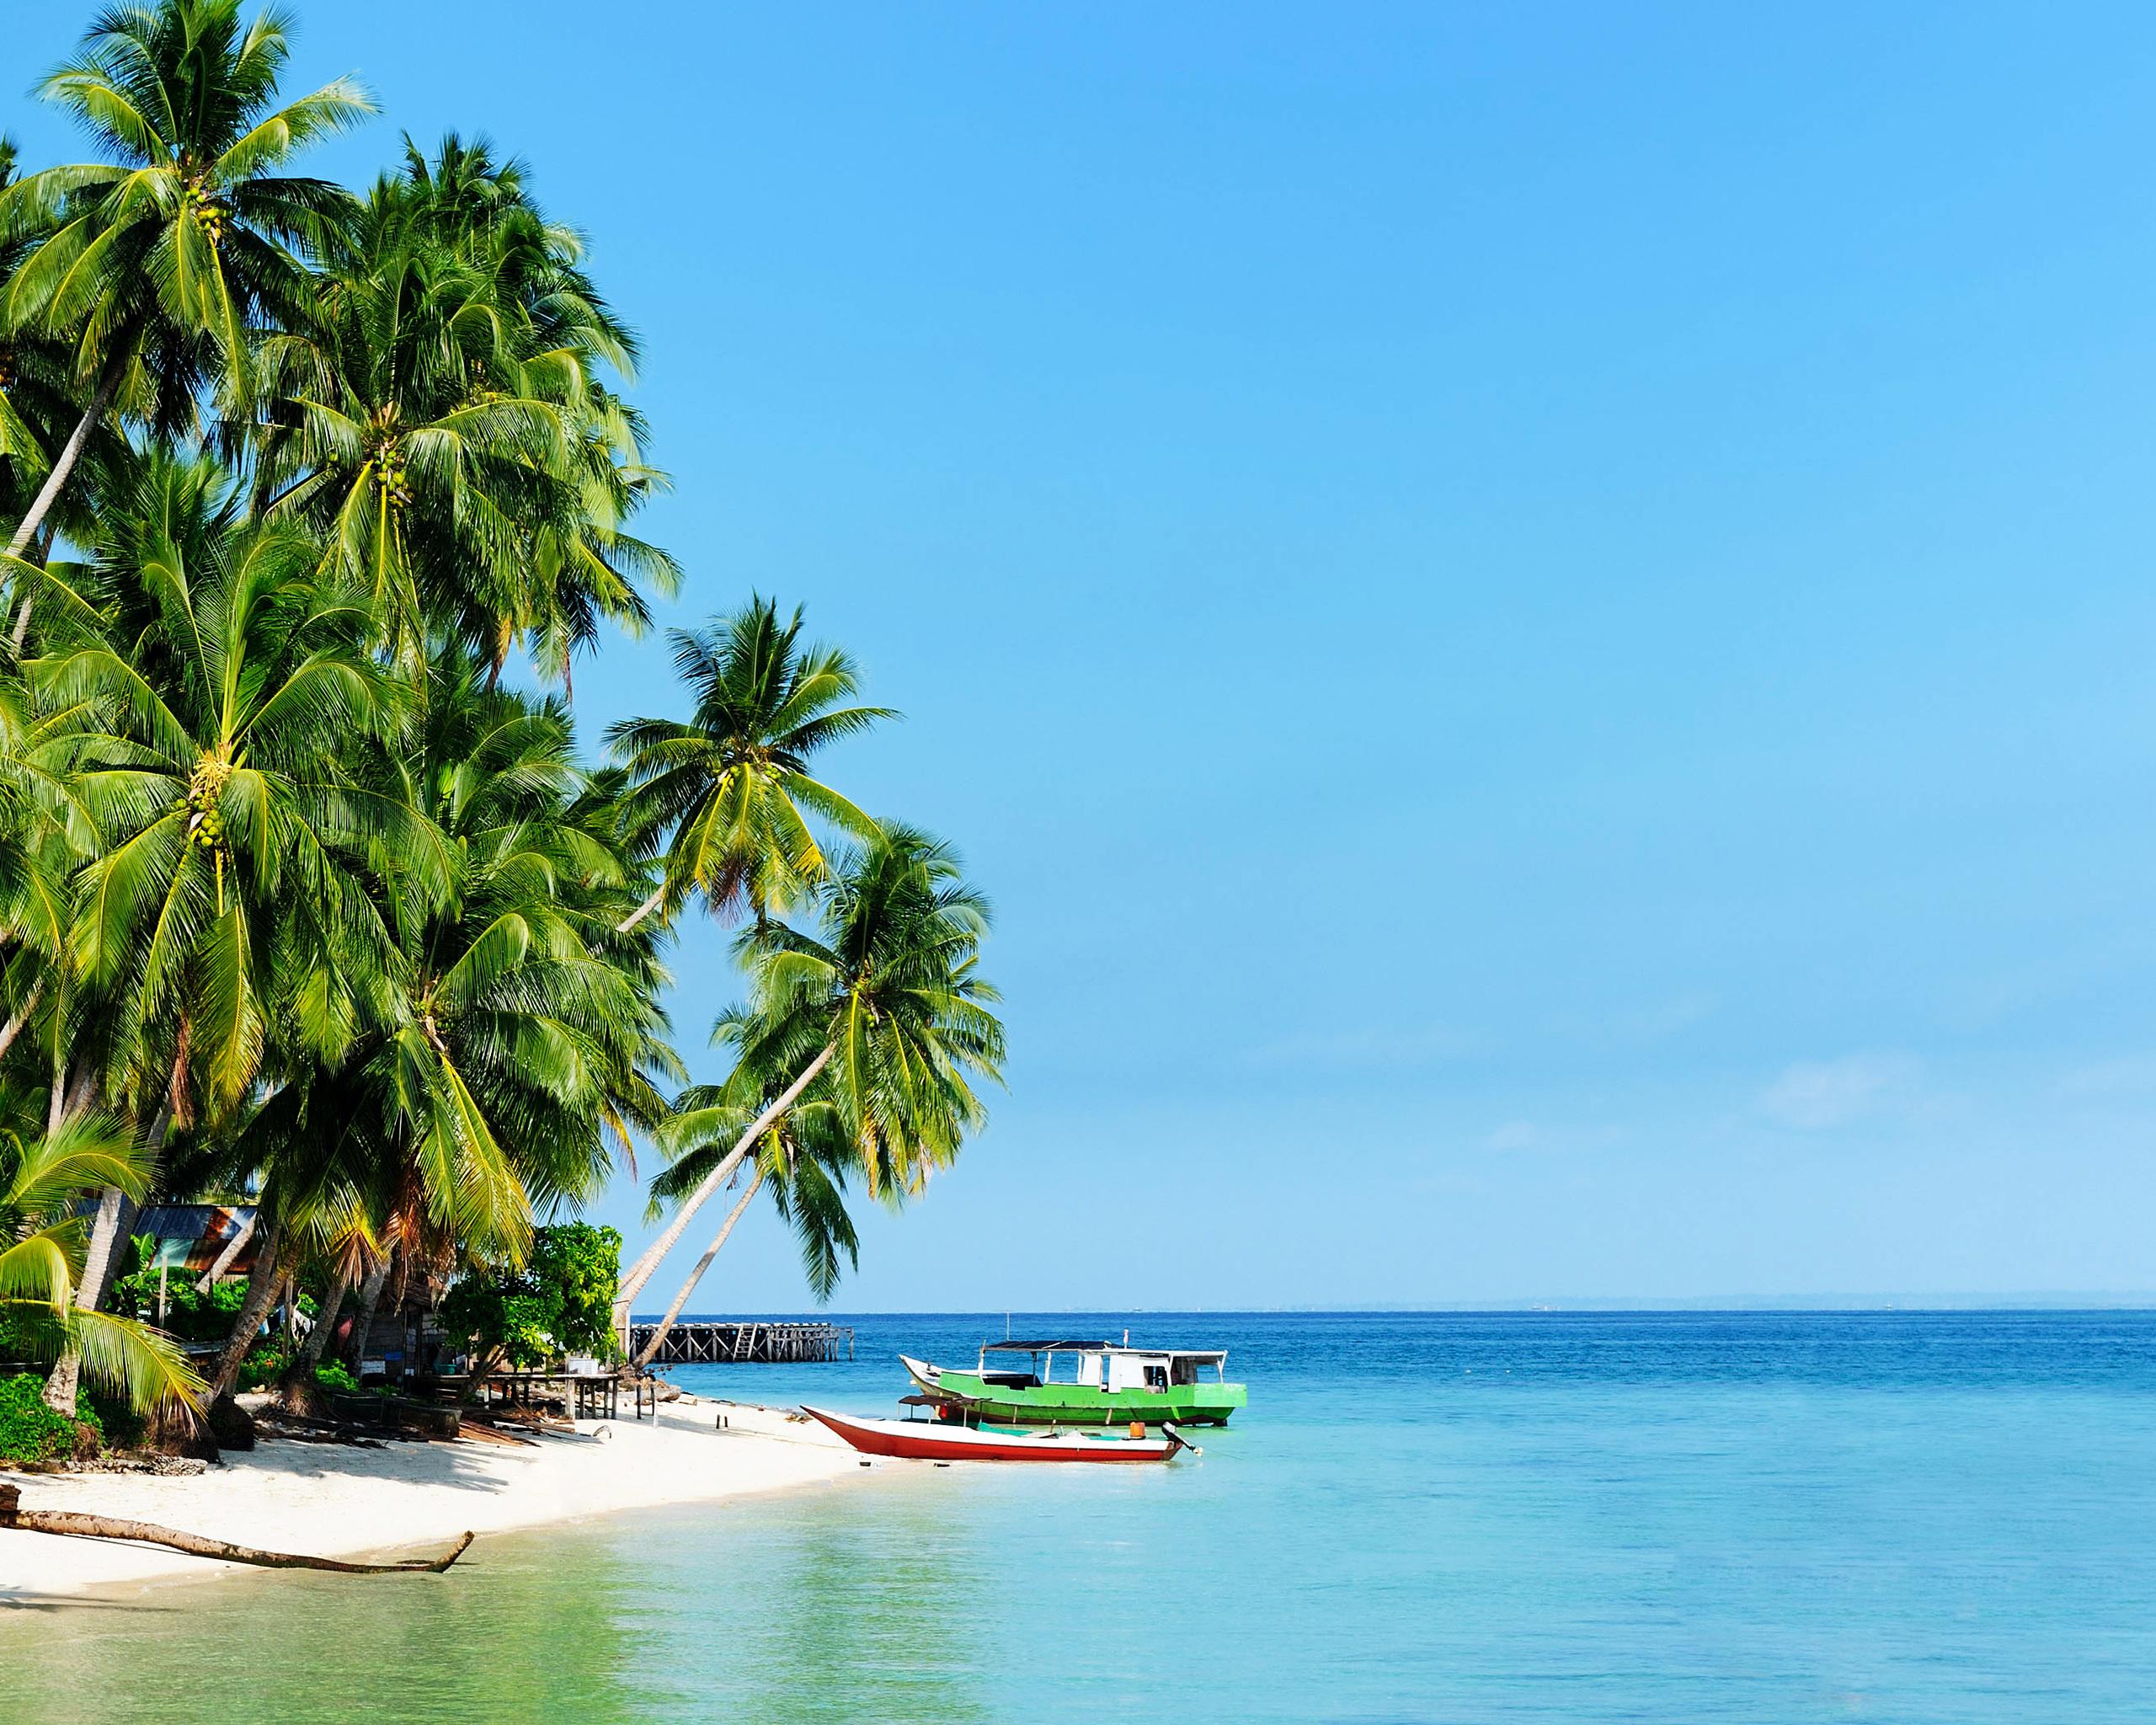 White Sandy Beach Of The Derawan Islands Wallpaper